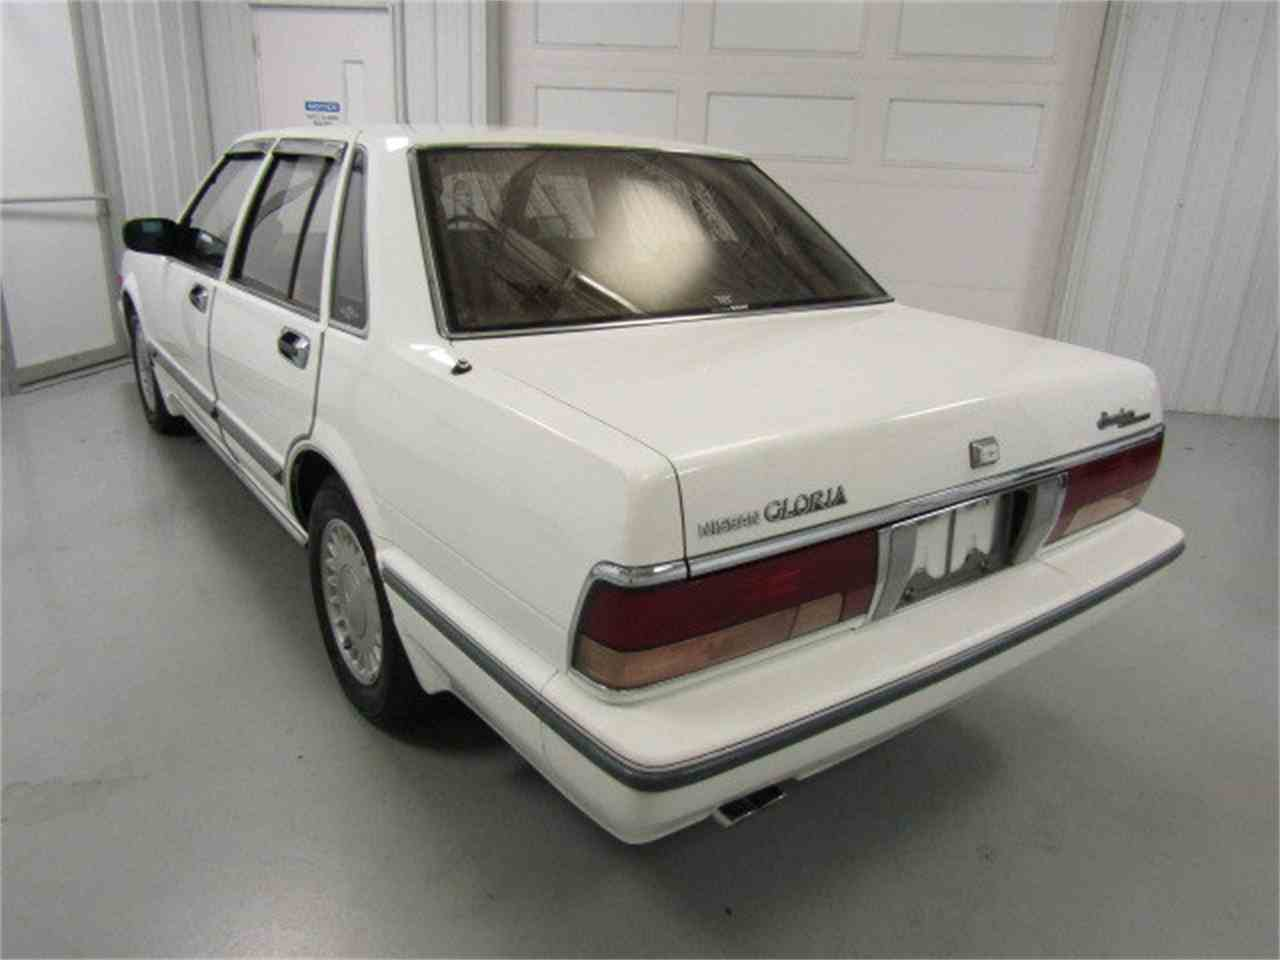 Large Picture of '91 Gloria located in Virginia - $6,999.00 - JZ2U